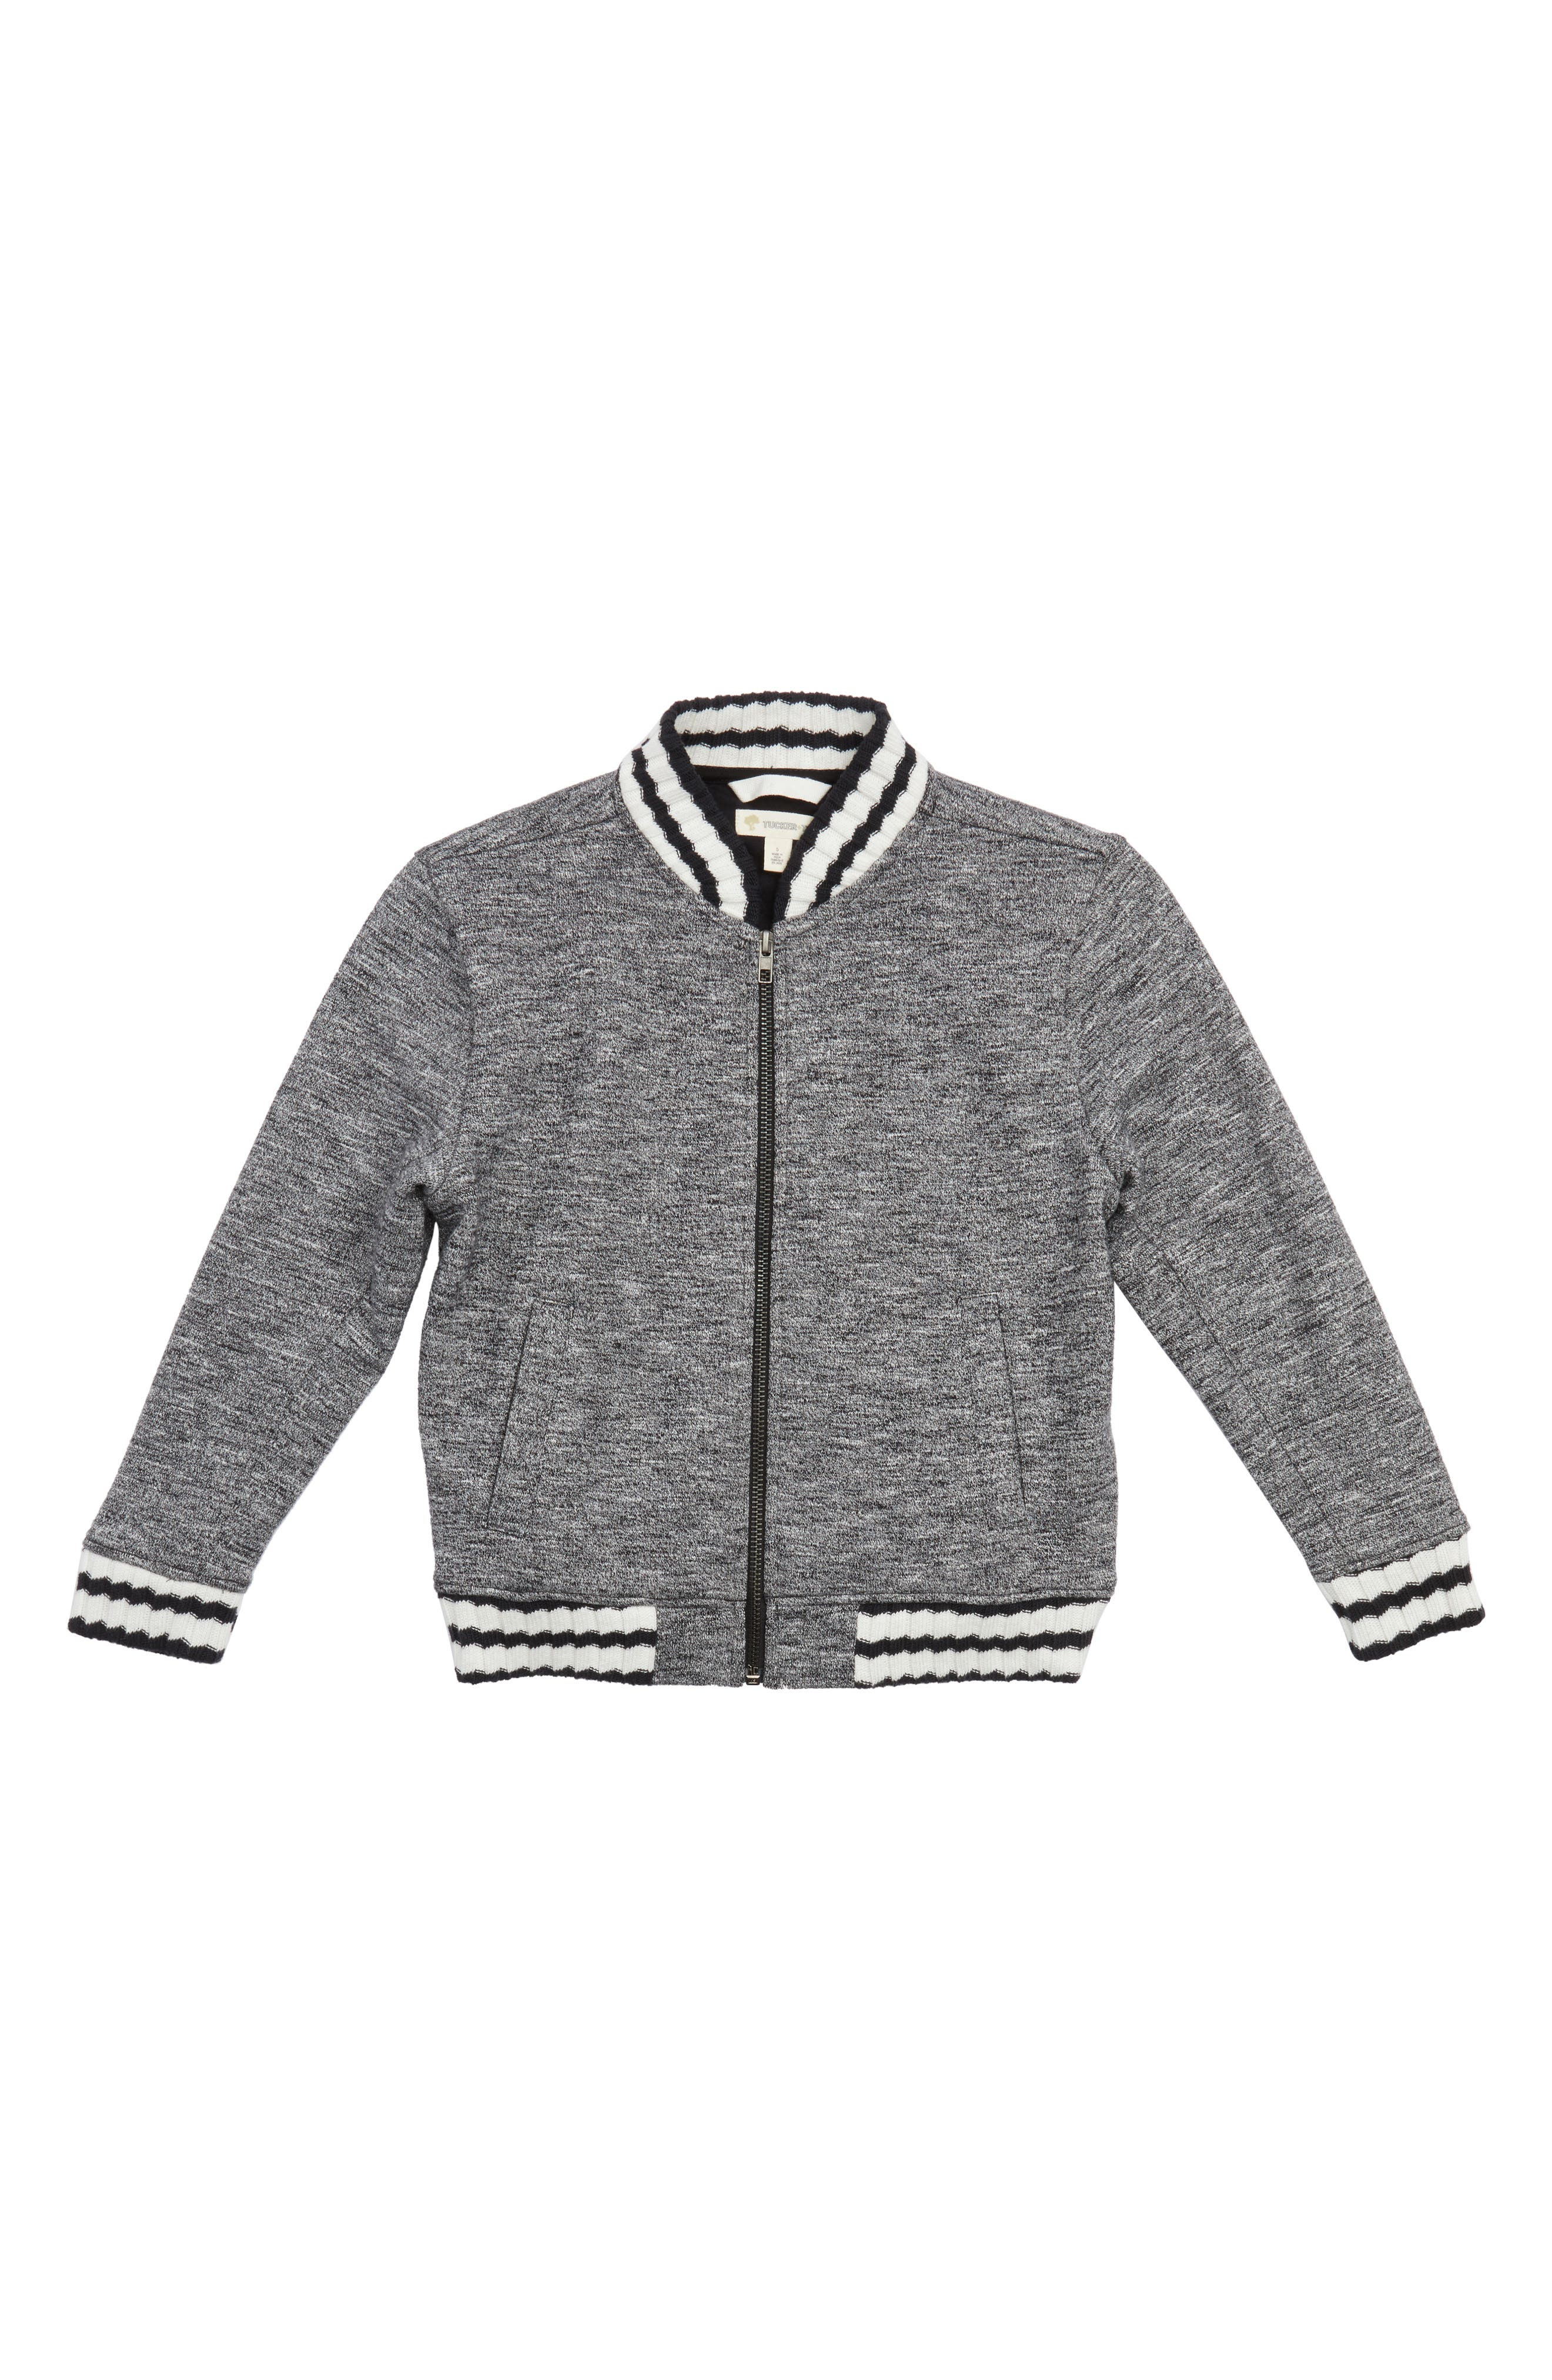 Mélange Varsity Jacket,                             Main thumbnail 1, color,                             001